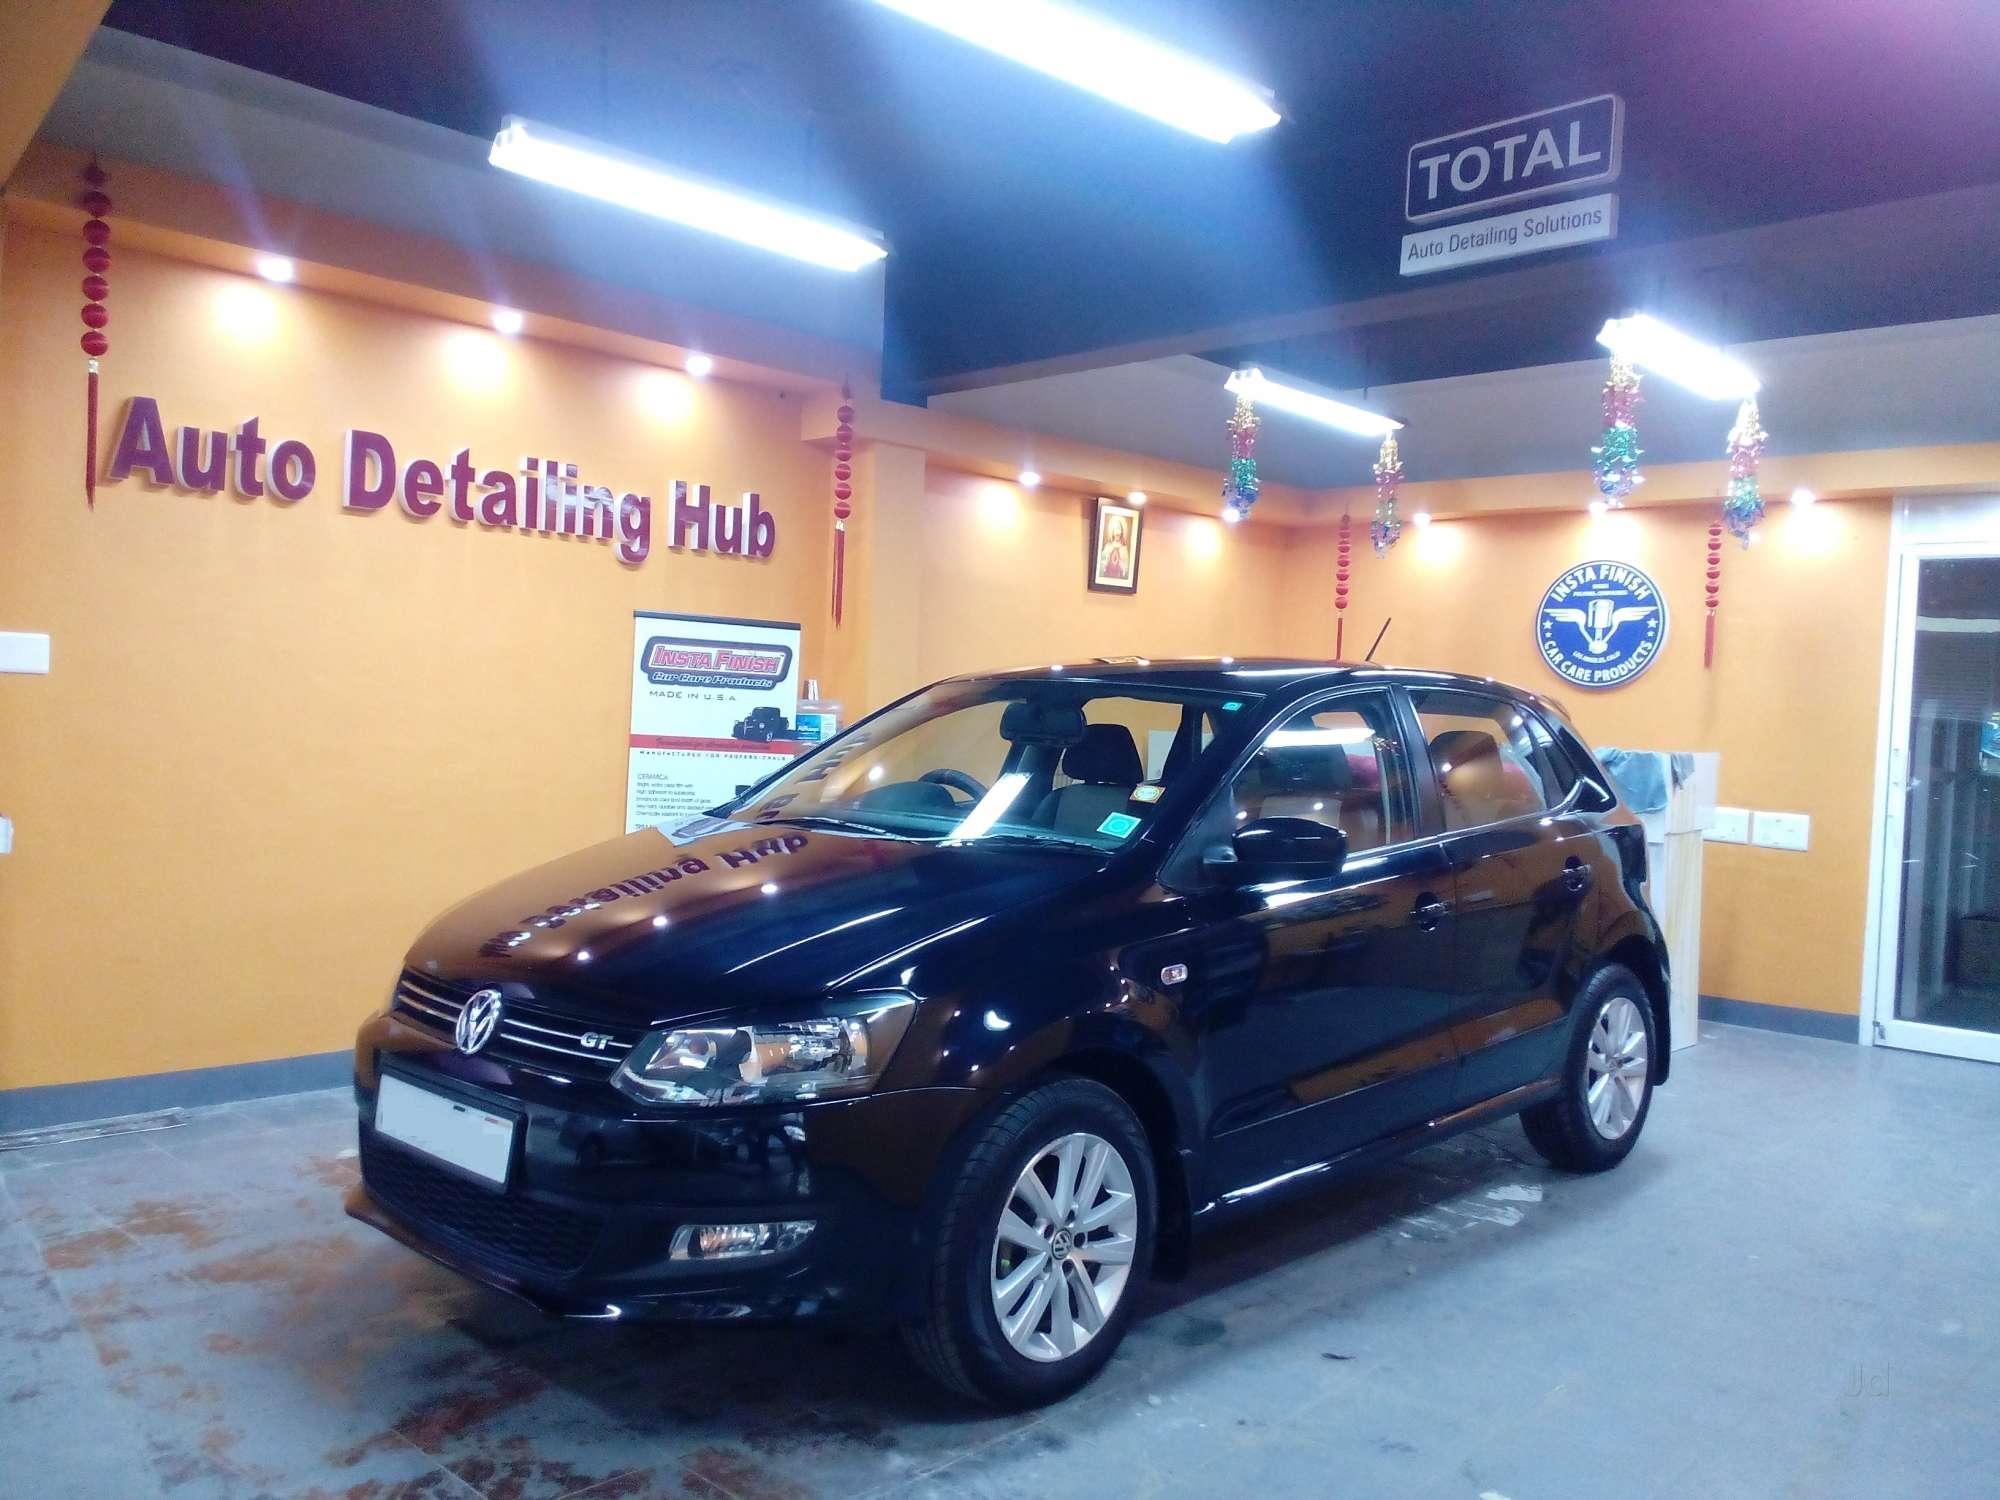 Auto Detailing and Restoration